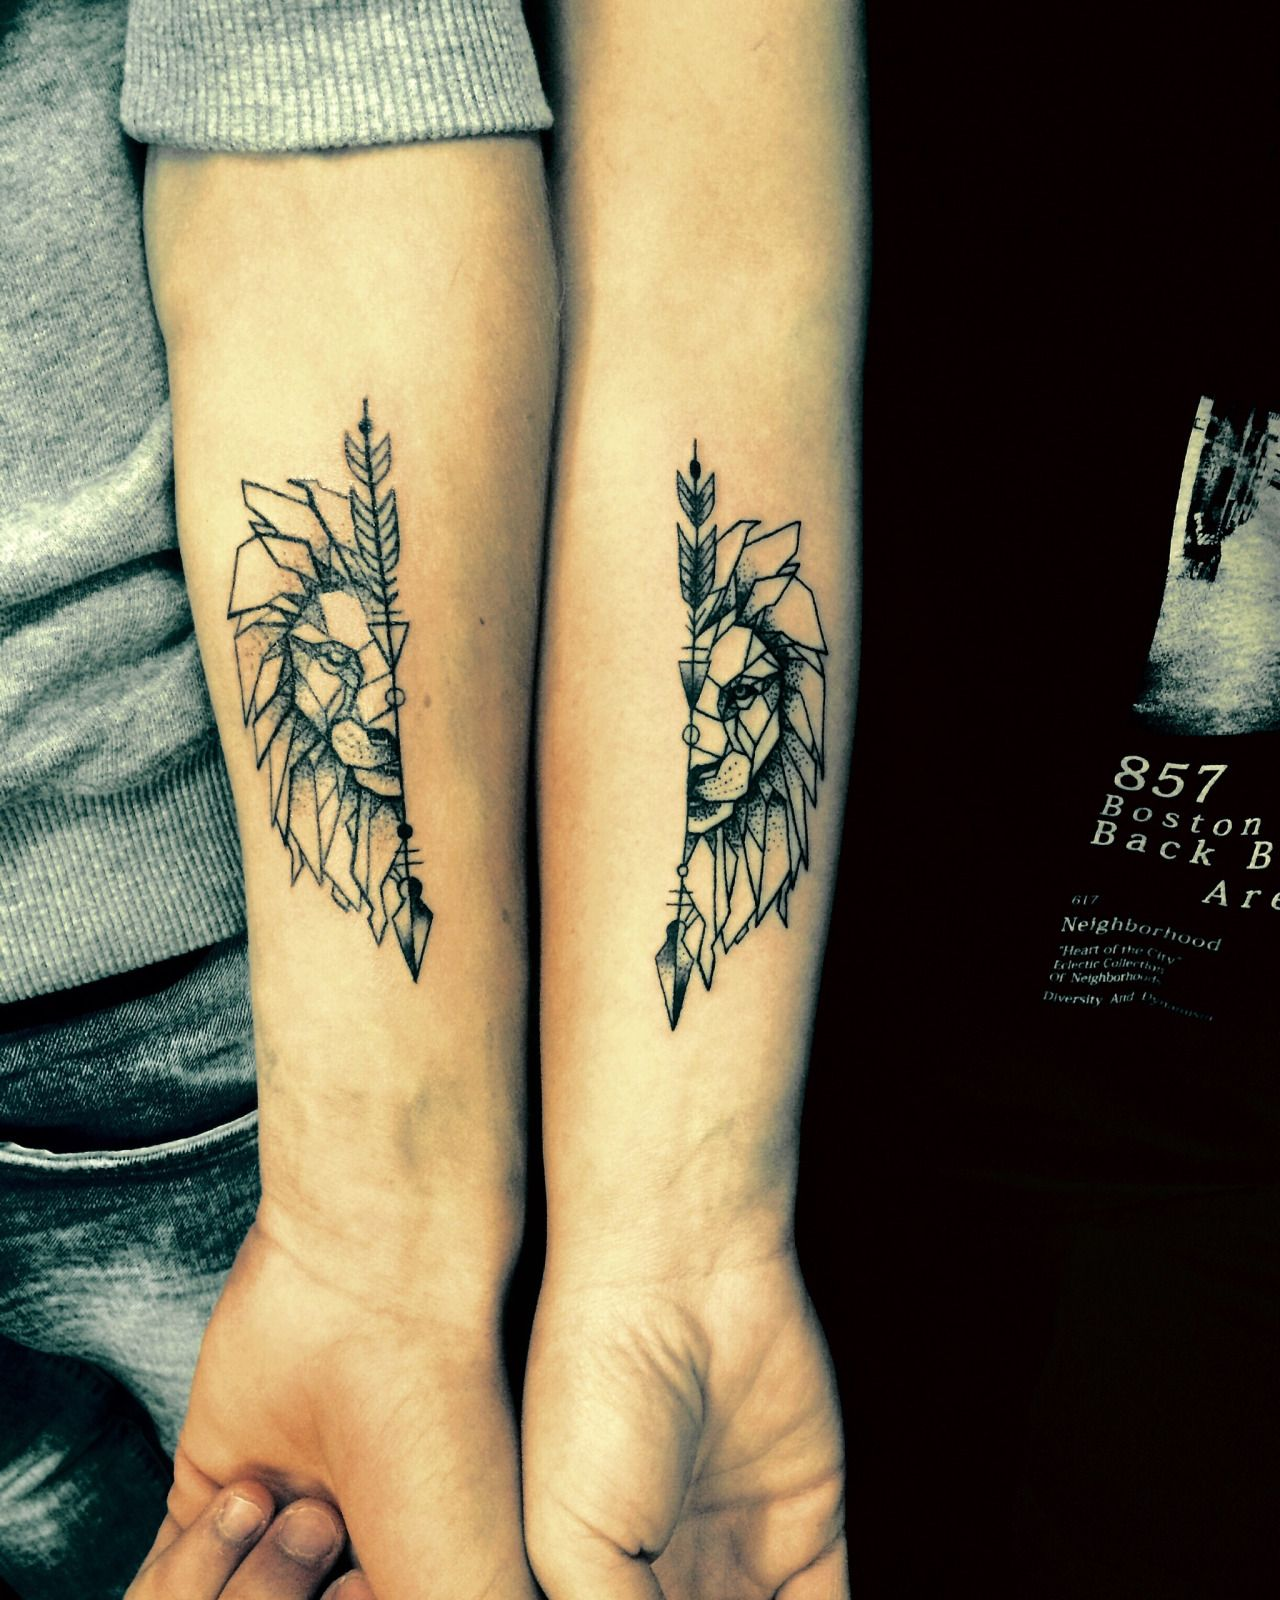 Matching Tattoos Day Mandram Tattoos Piercings Friendship